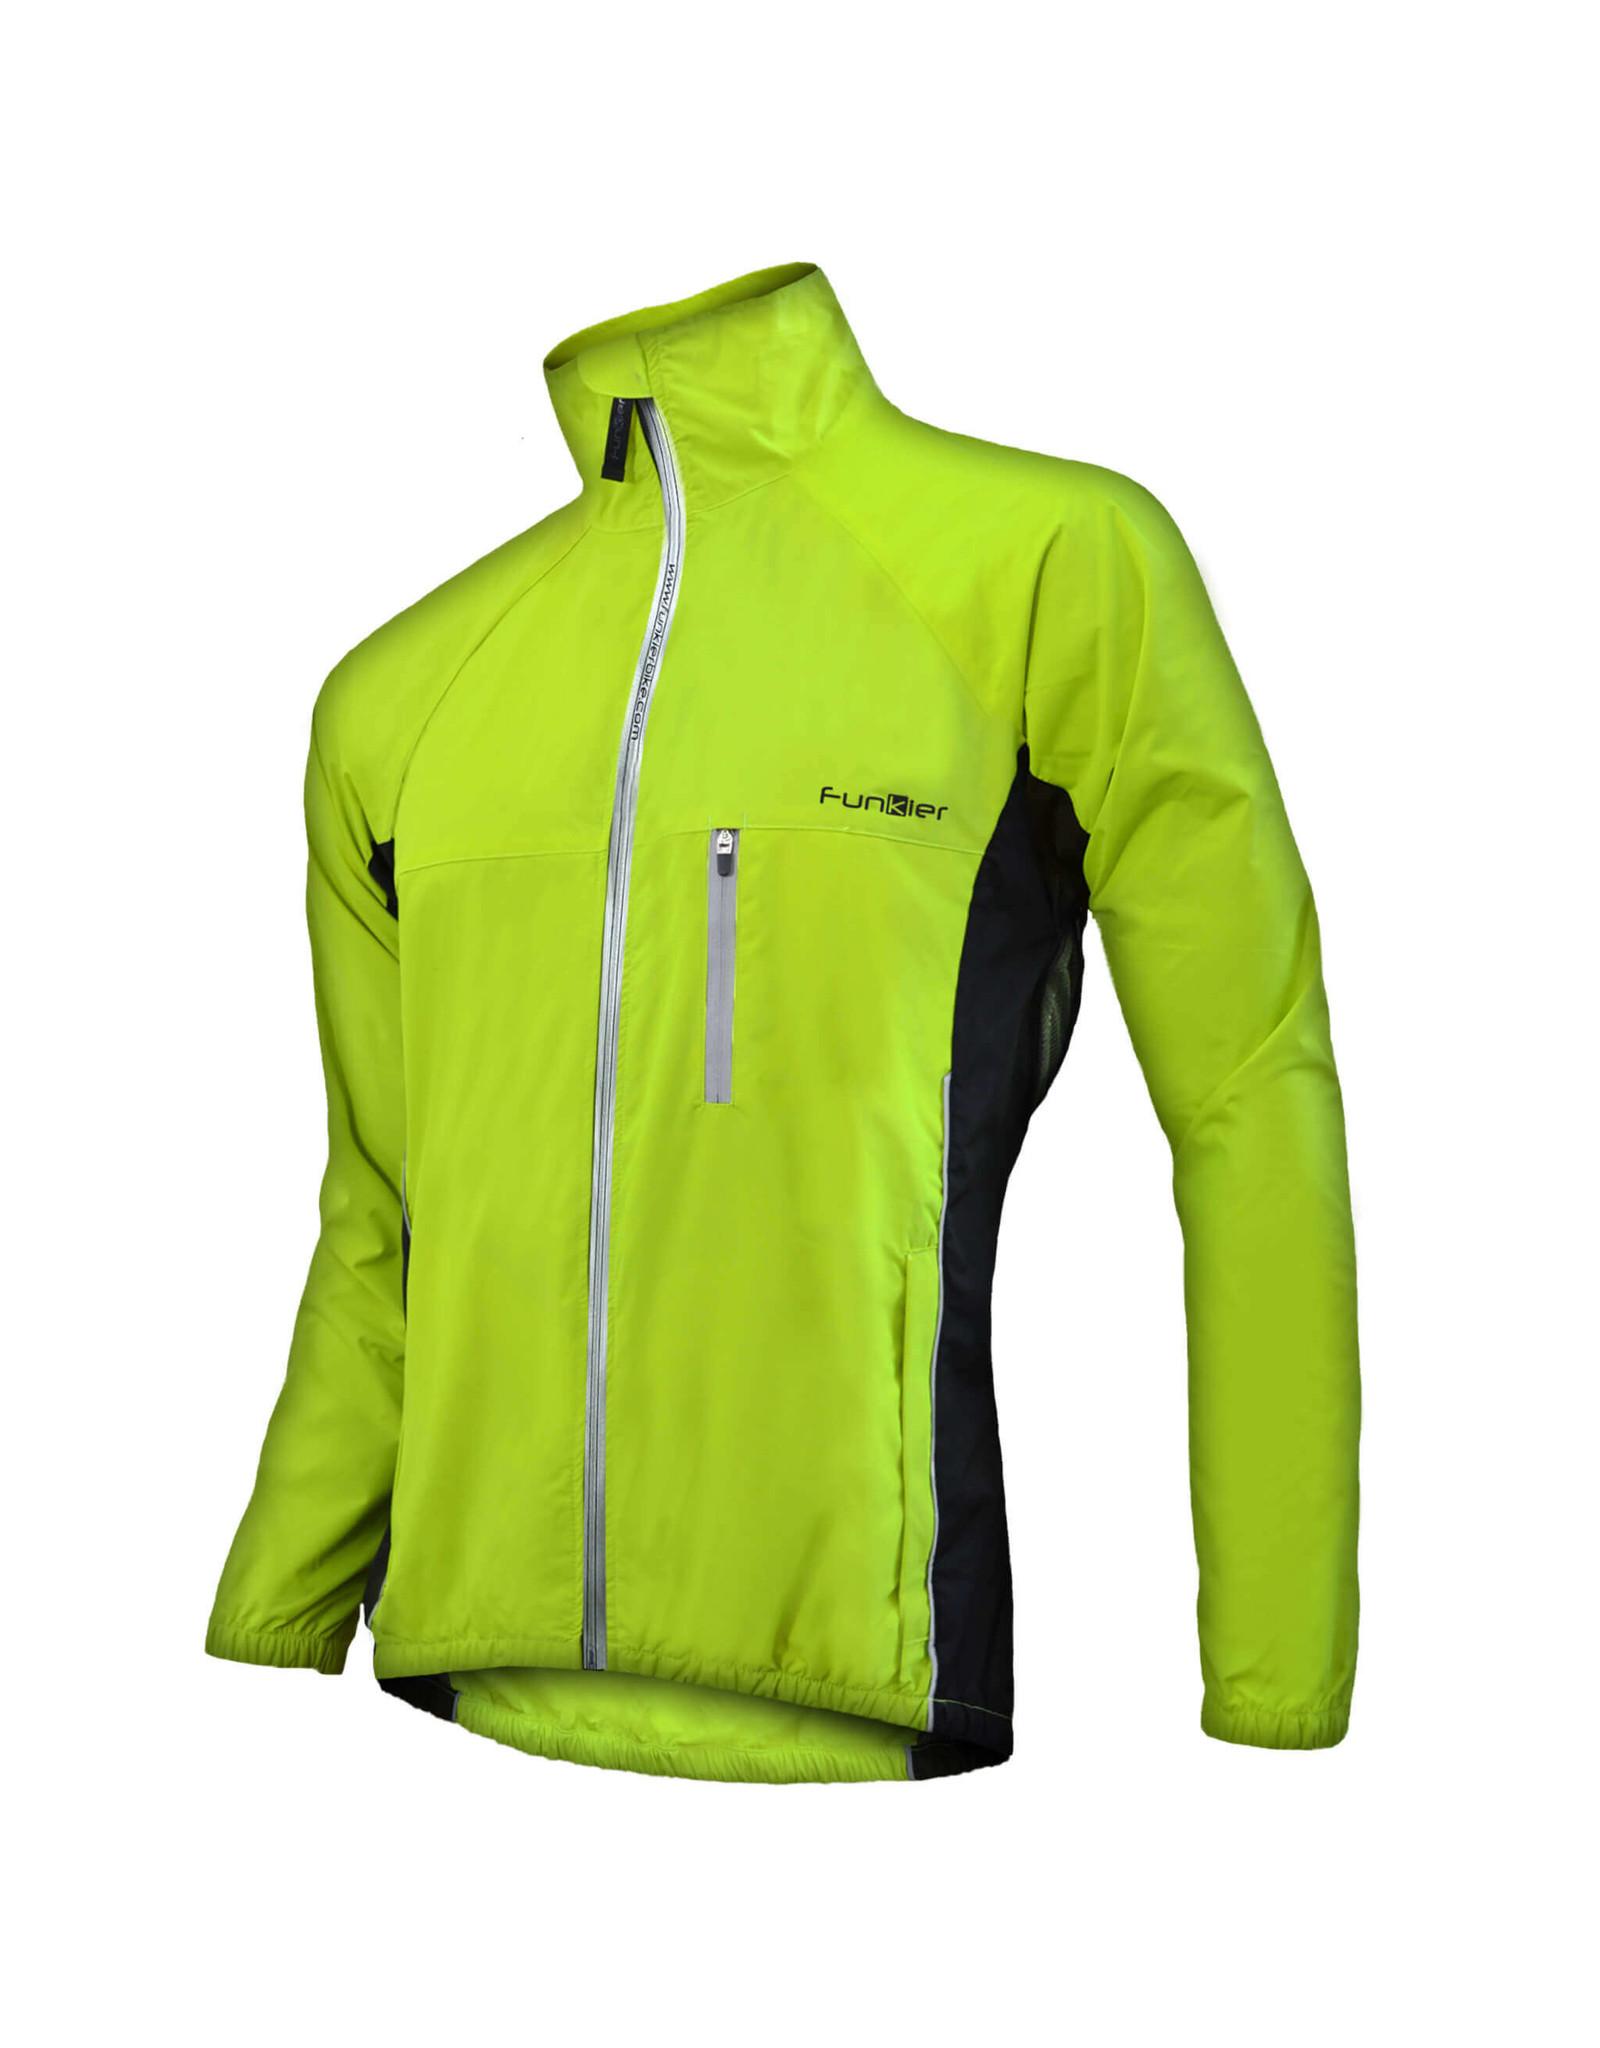 FUNKIER Lulno Yellow Waterproof Jacket